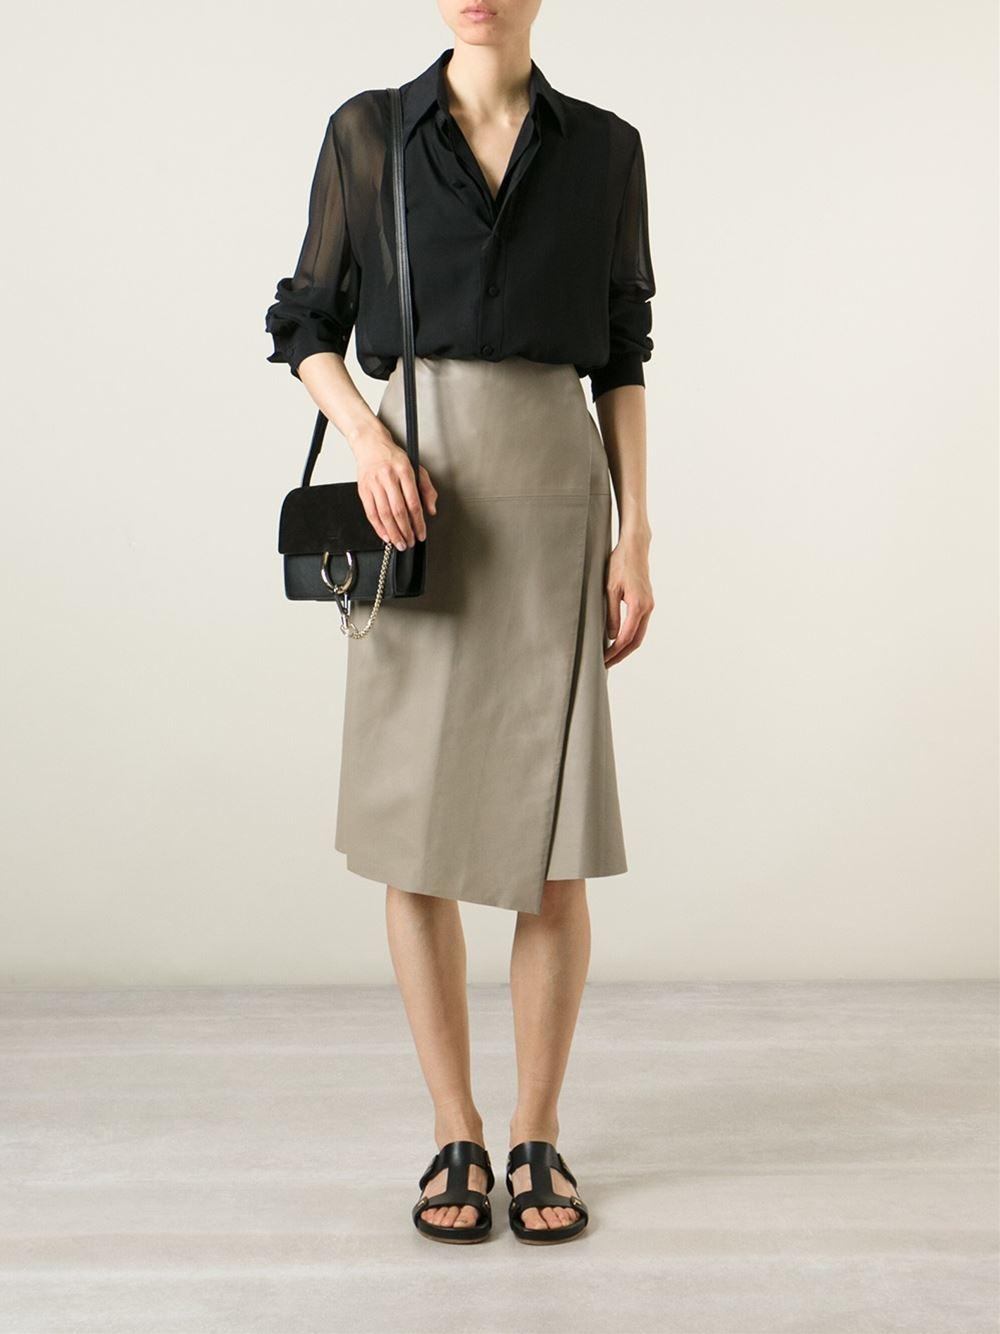 9fd4ee7c3a Chloé Black Faye Calf Leather Satchel